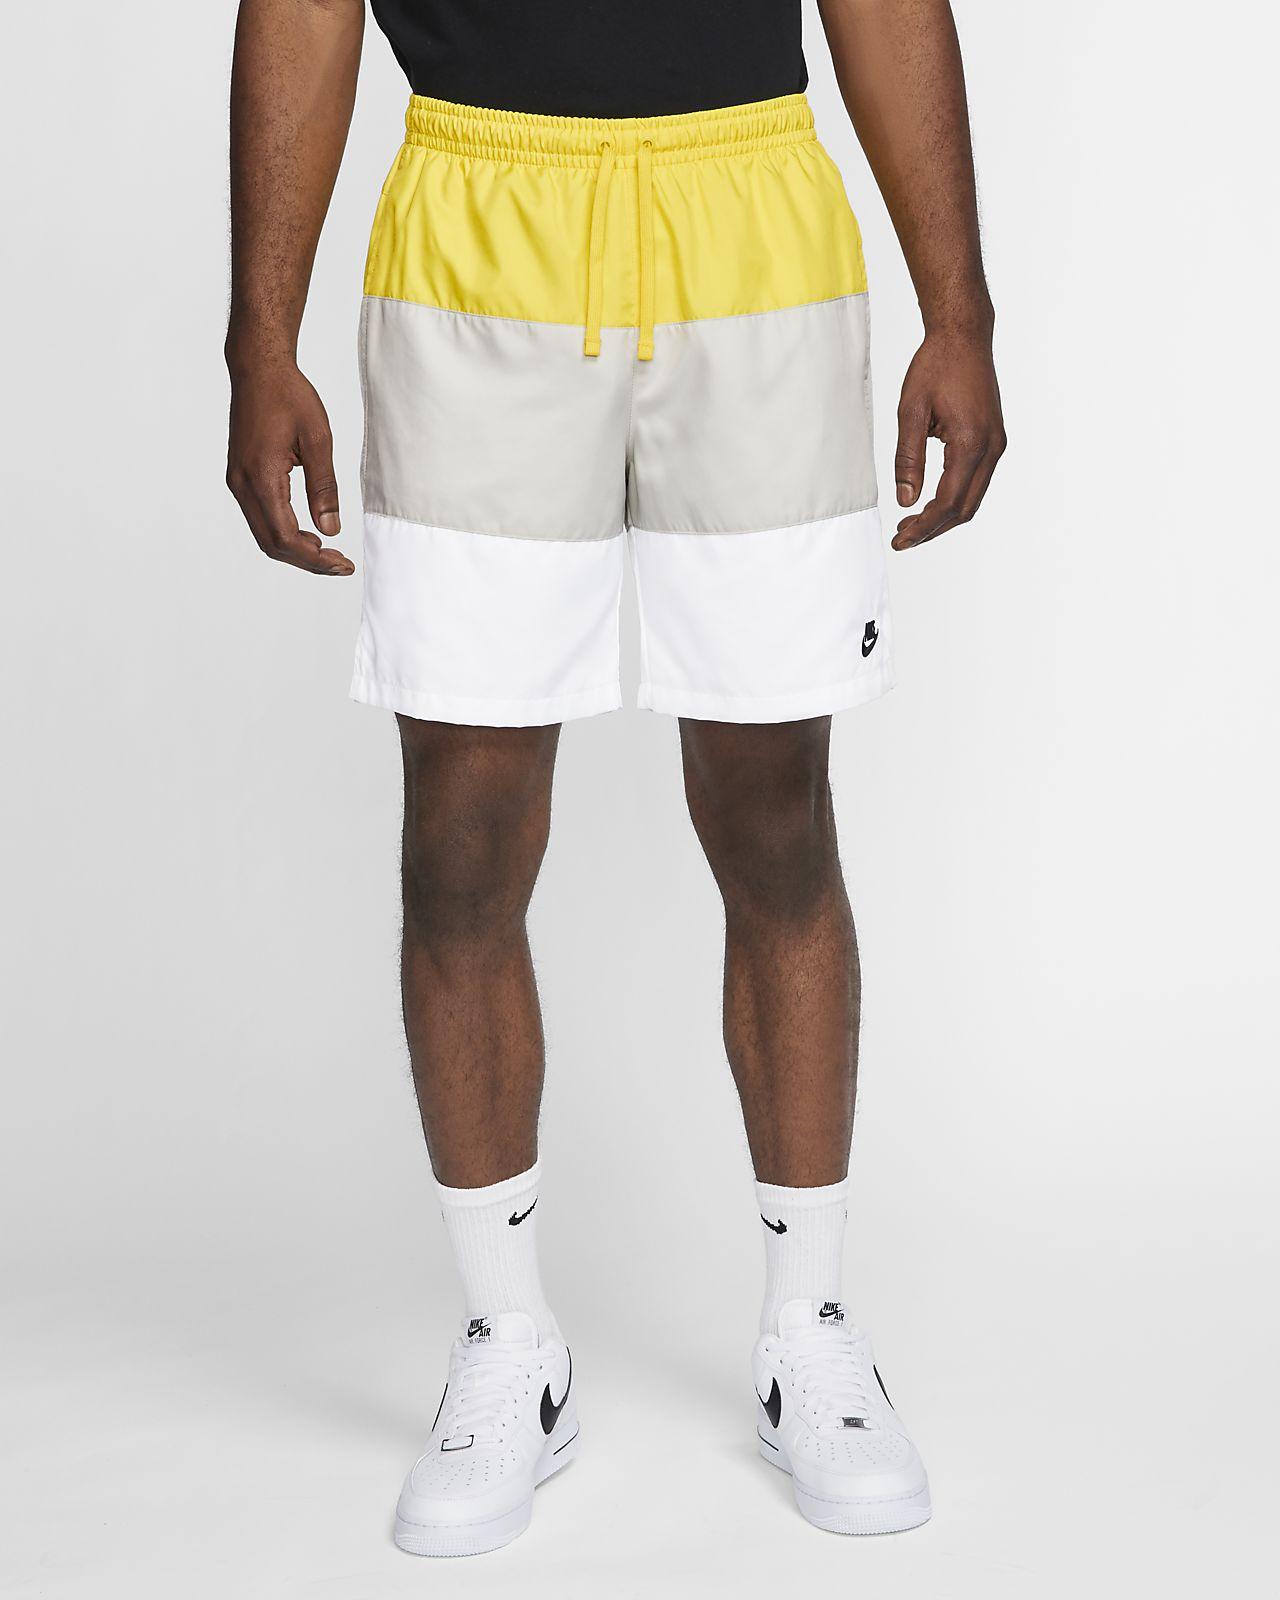 Shorts de tejido Woven para hombre Nike Sportswear City Edition